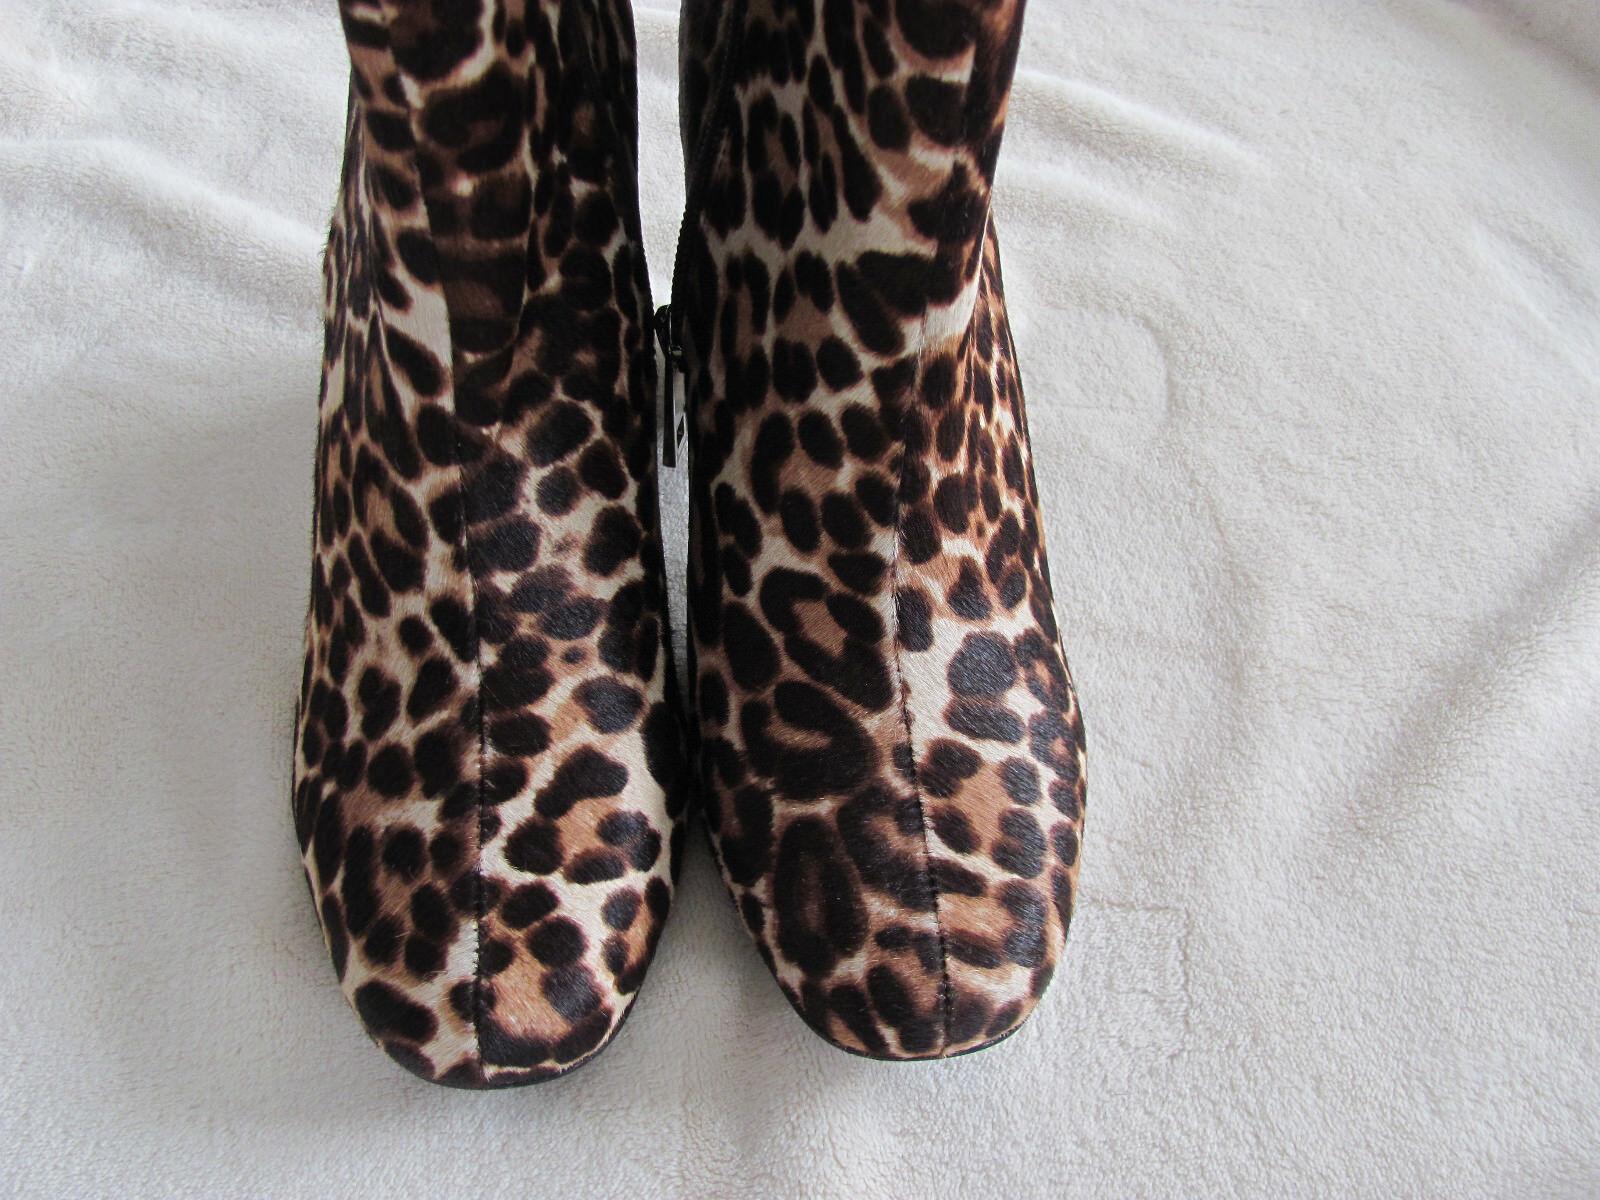 Charles David Studio Leopard Calf Hair Boot Bootie-Side Zipper NIB - Größe 8M - NIB Zipper bb68fa